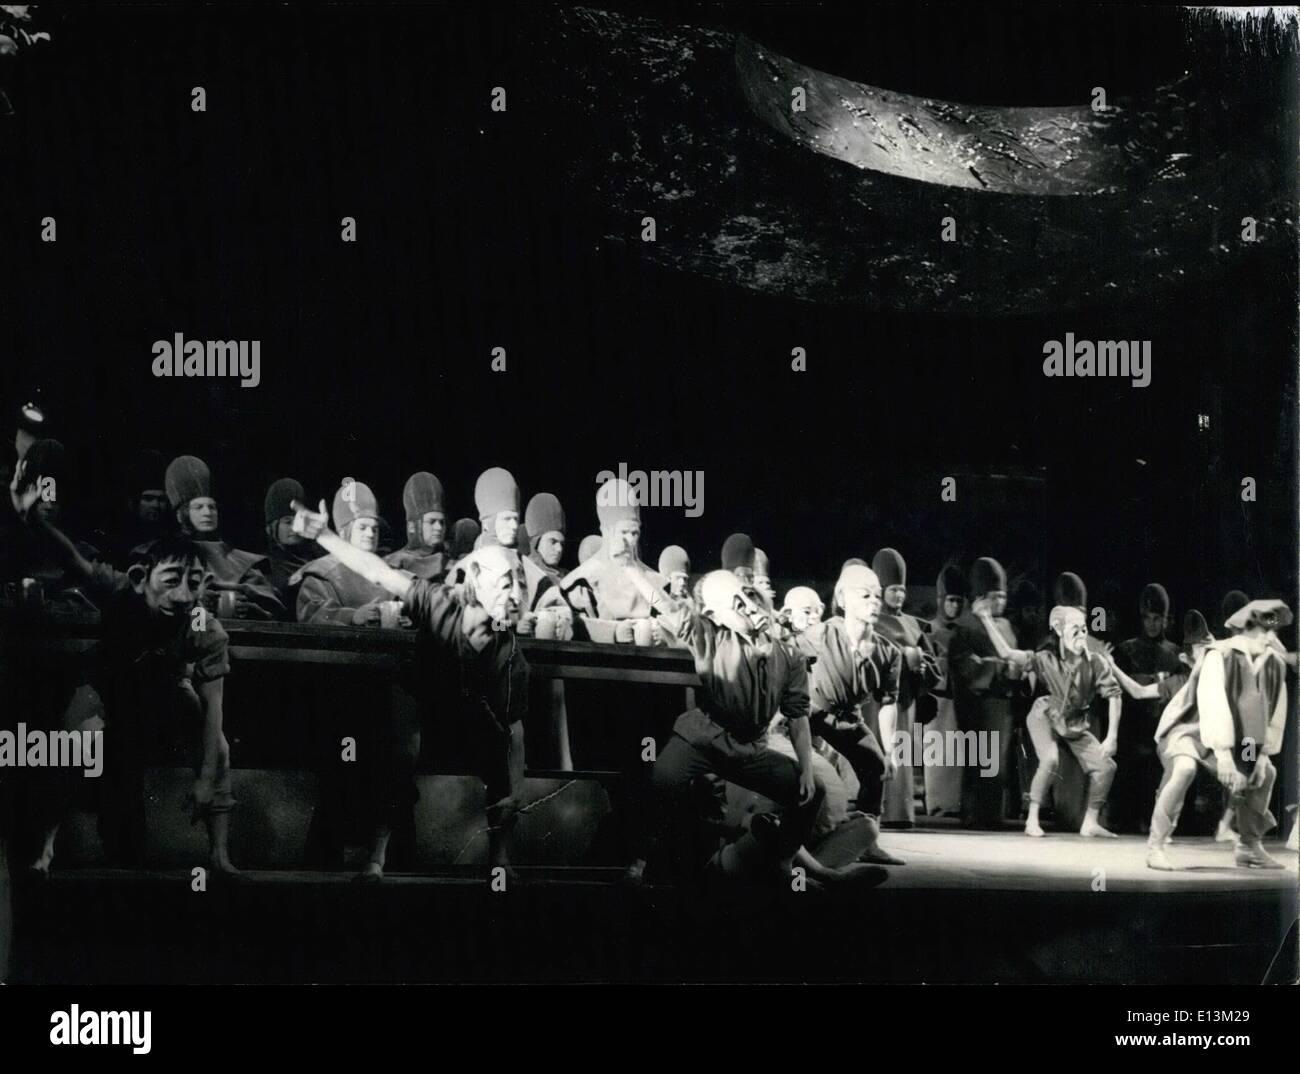 Mar. 02, 2012 - A Revolutionary ''Damnation of Faust'' presented at the Paris Opera. The Opera de Paris decided Stock Photo